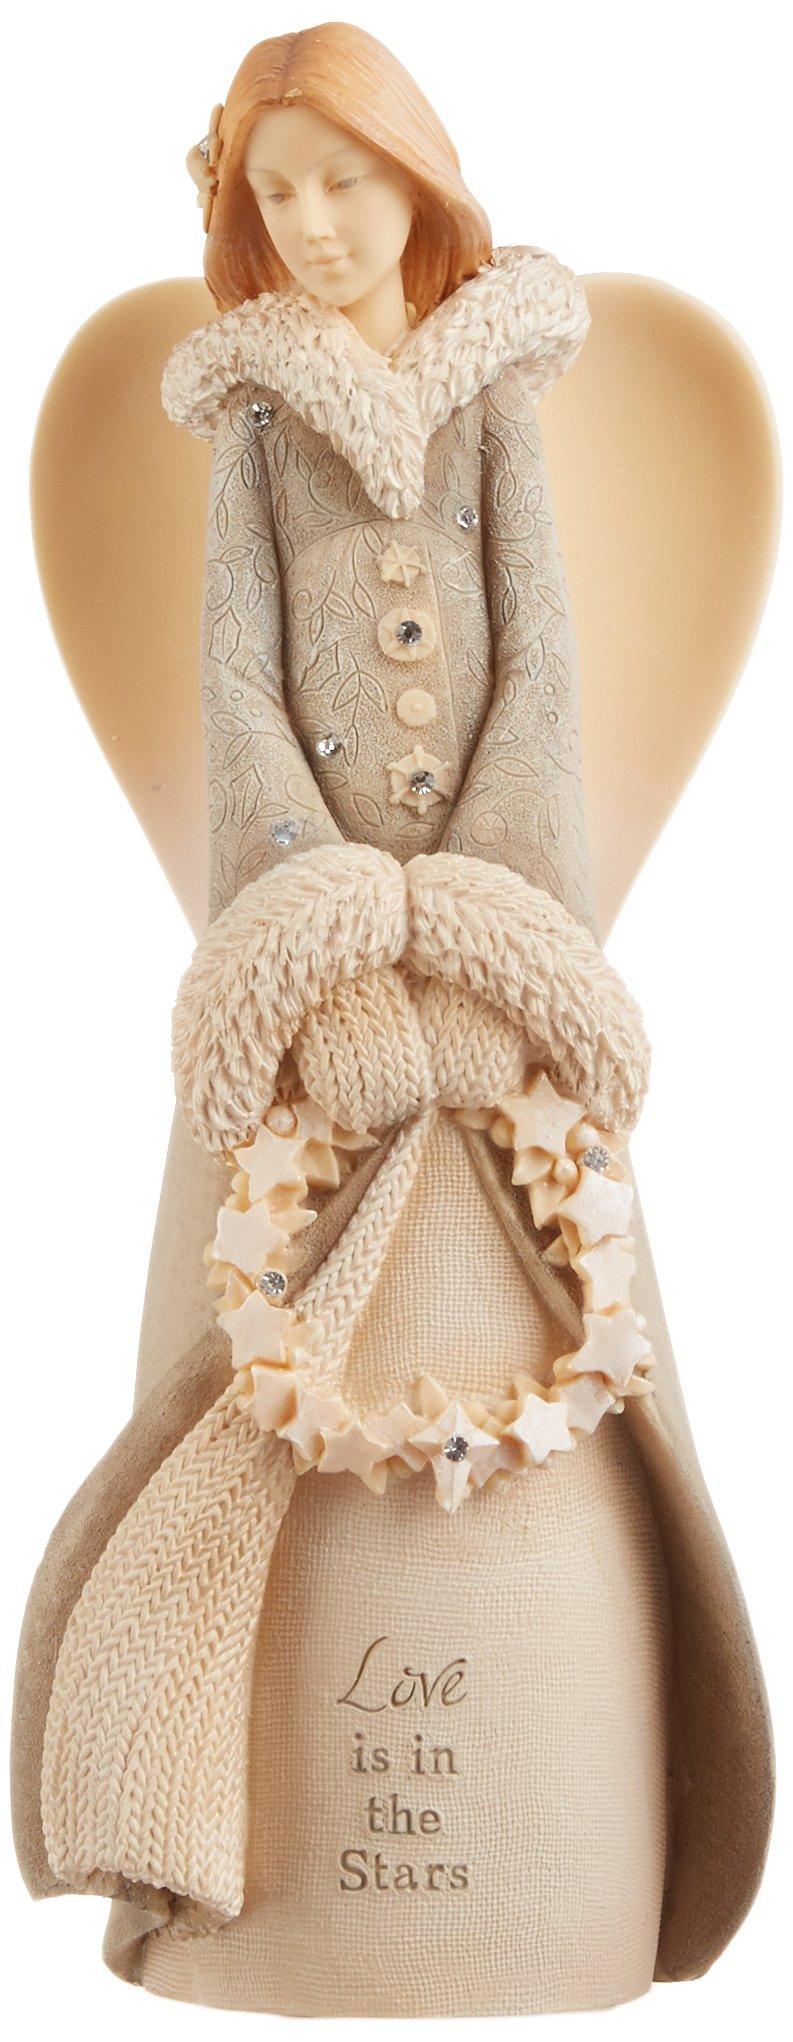 Enesco Foundations Angel with Wreath Figurine, 7.68-Inch